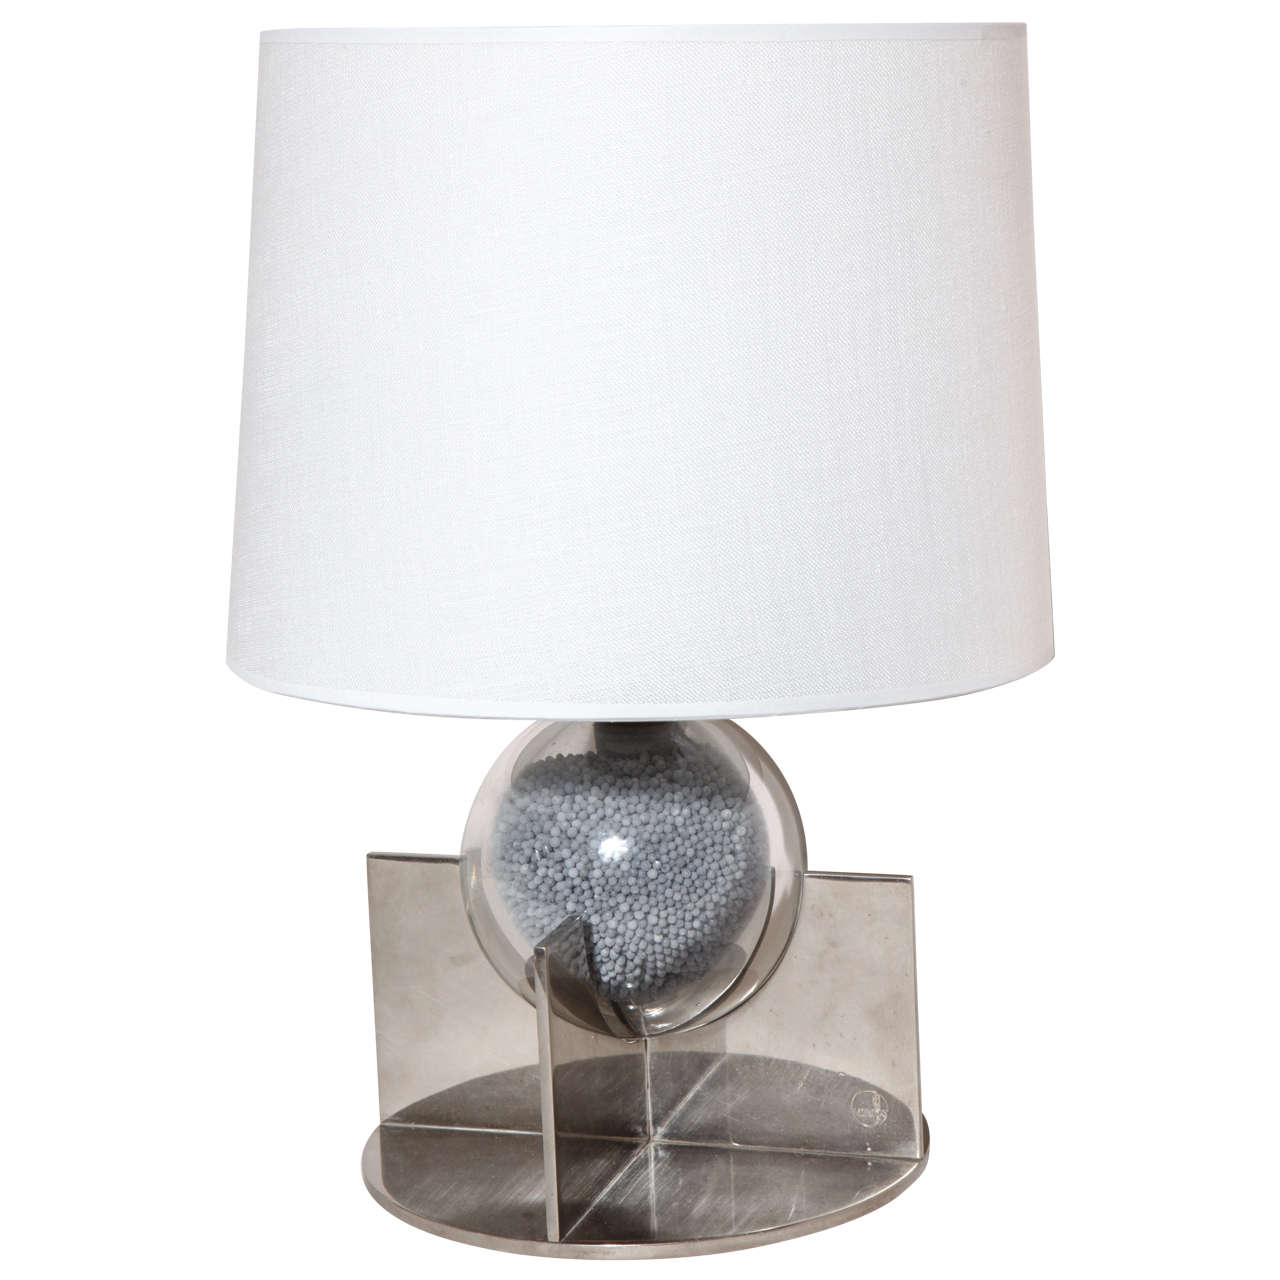 Boris Jean Lacroix Art Deco Table Lamp